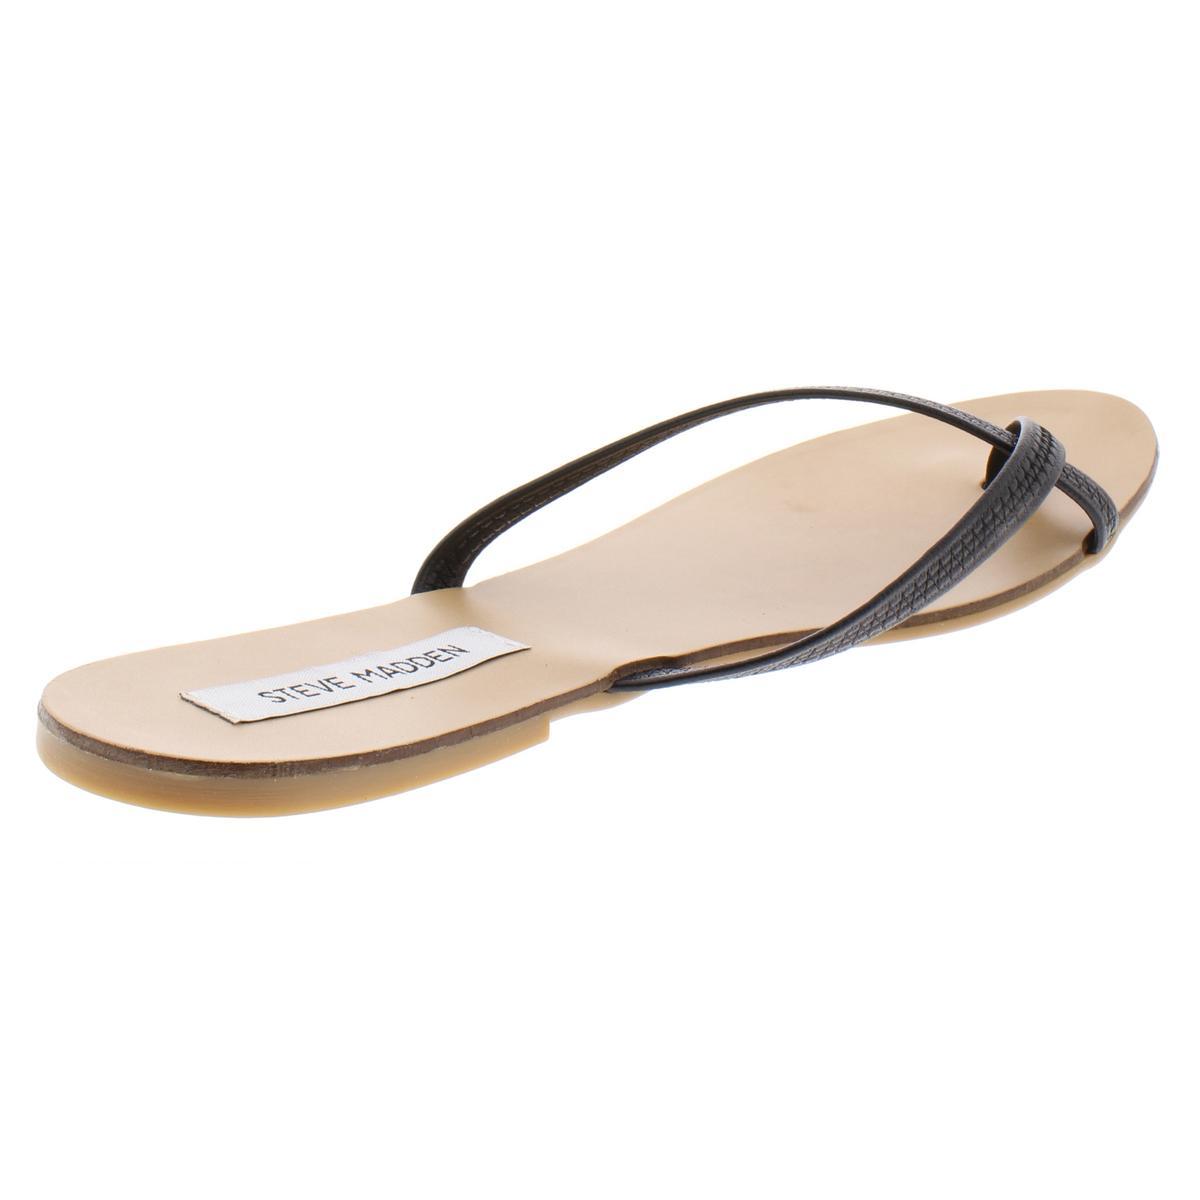 Steve-Madden-Womens-Coast-Toe-Loop-Stretch-Flats-Flip-Flops-Sandals-BHFO-0849 thumbnail 4